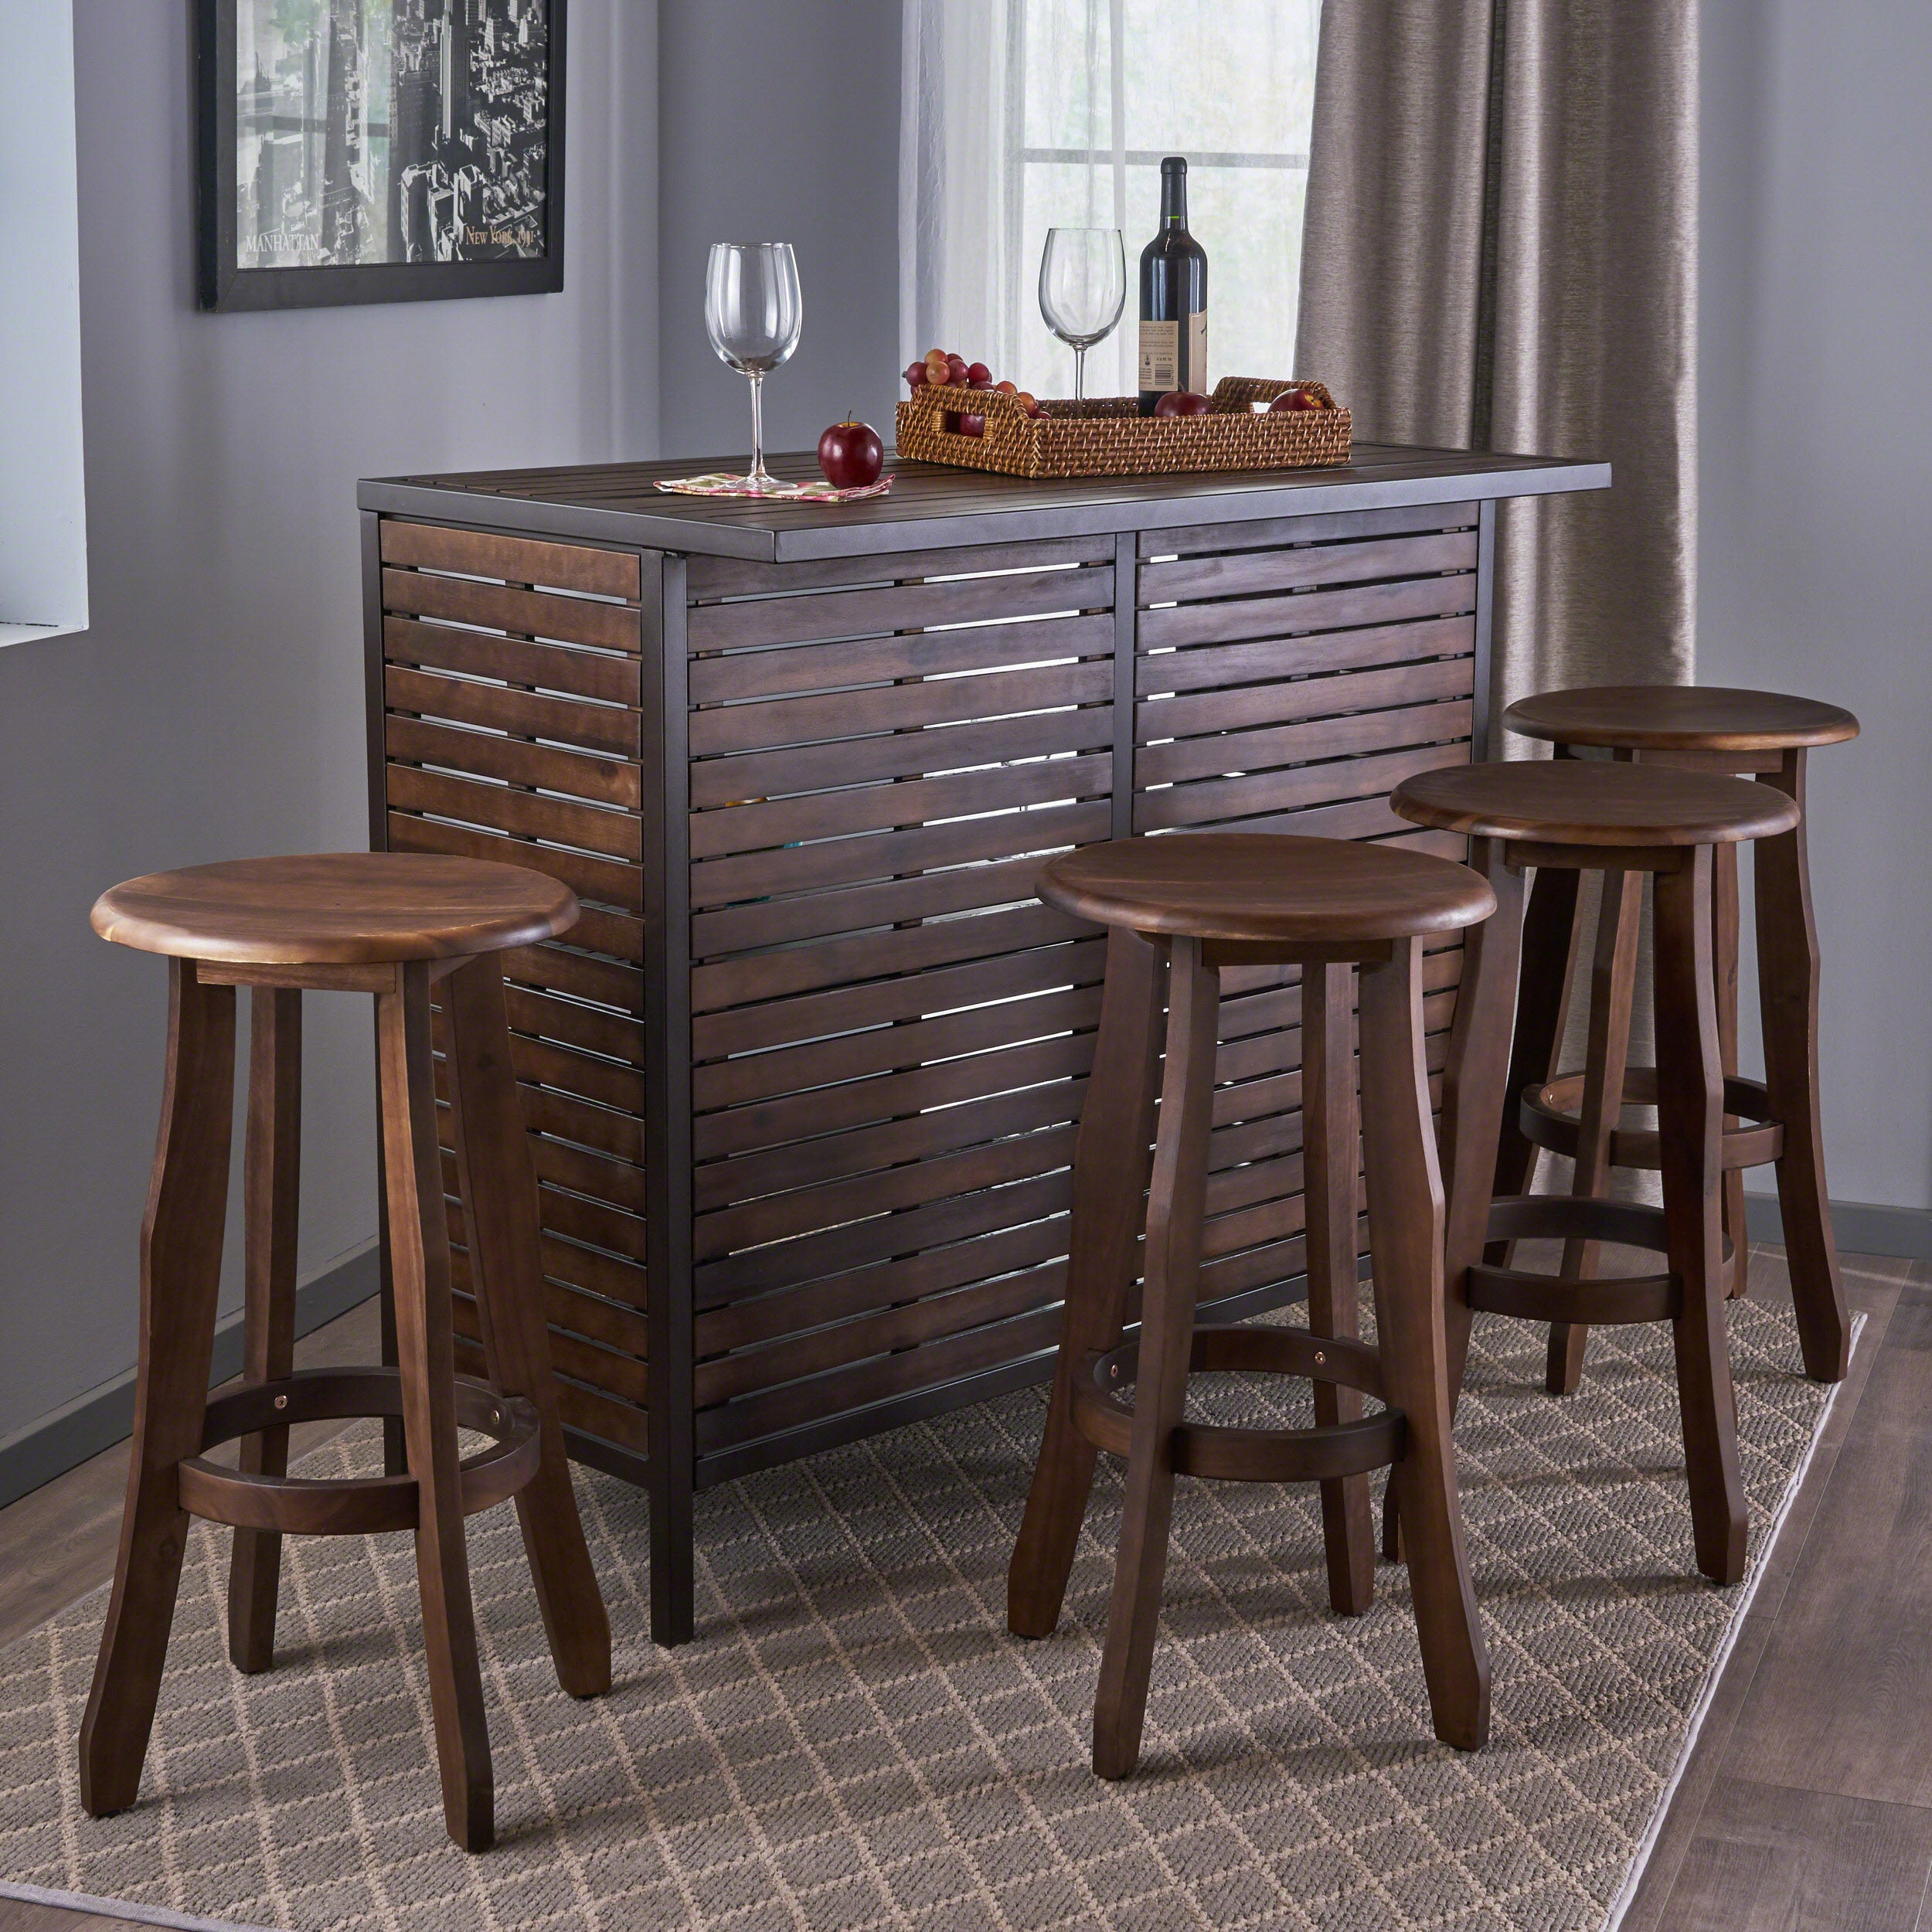 Christopher Knight Home Samala 5-Piece Acacia Wood Bar Set